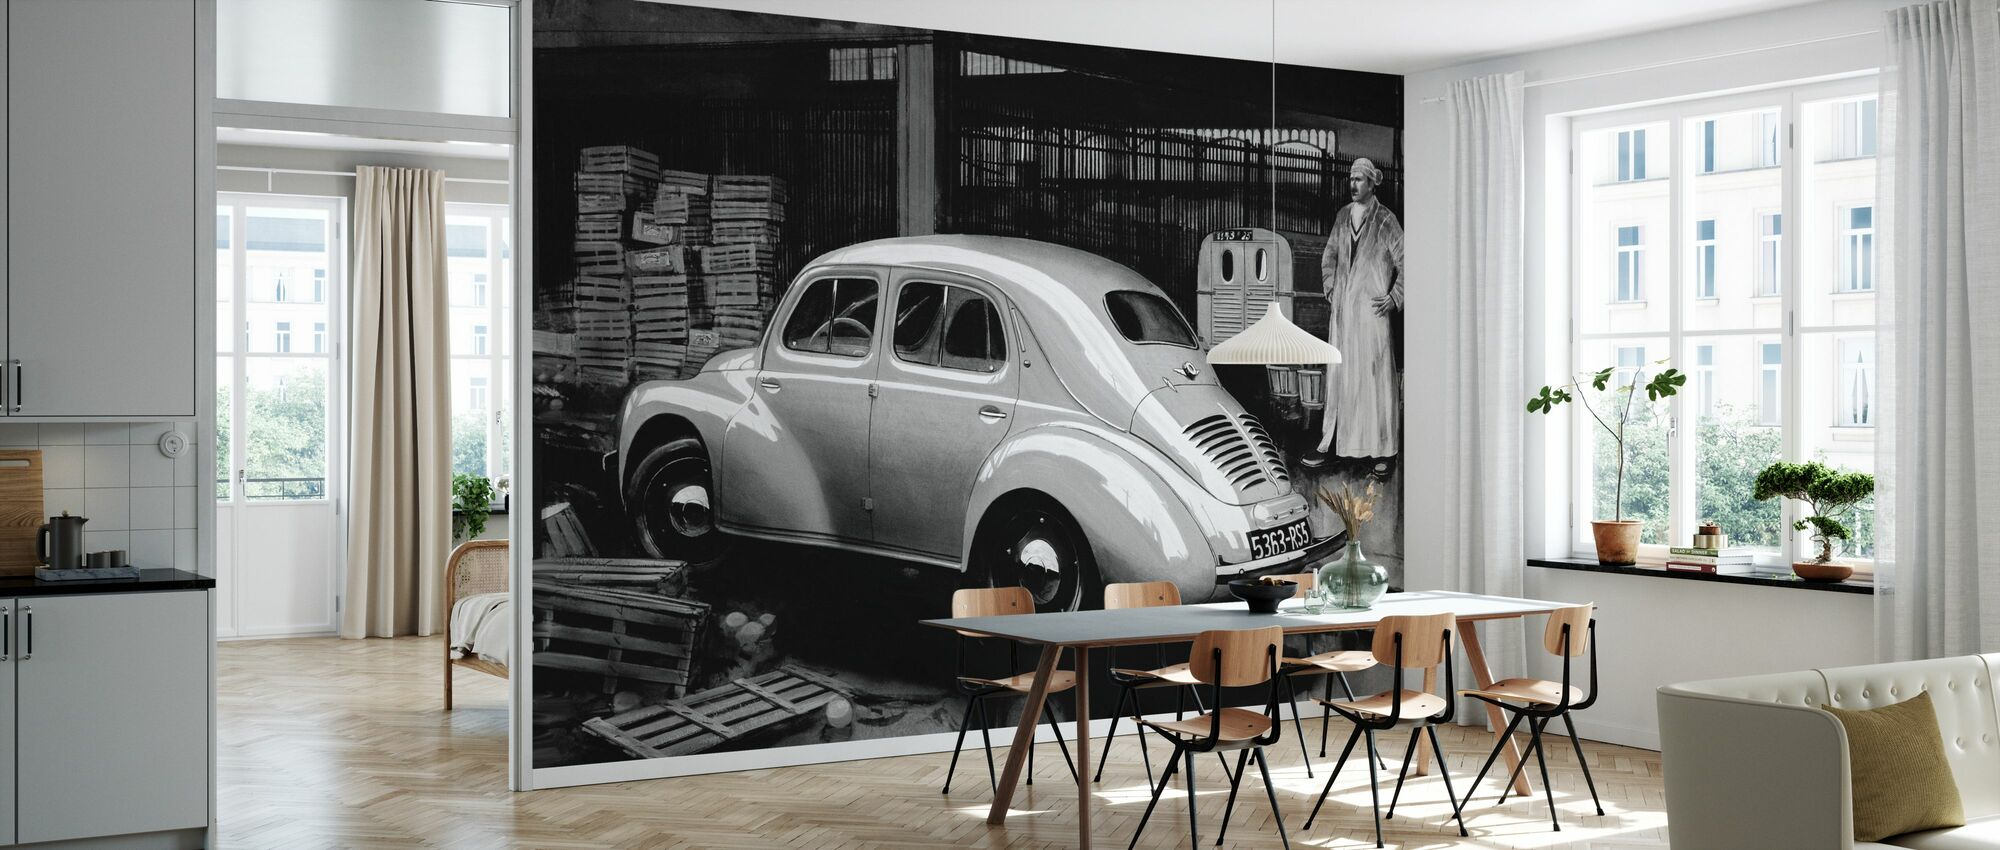 Classic Car BW - Wallpaper - Kitchen